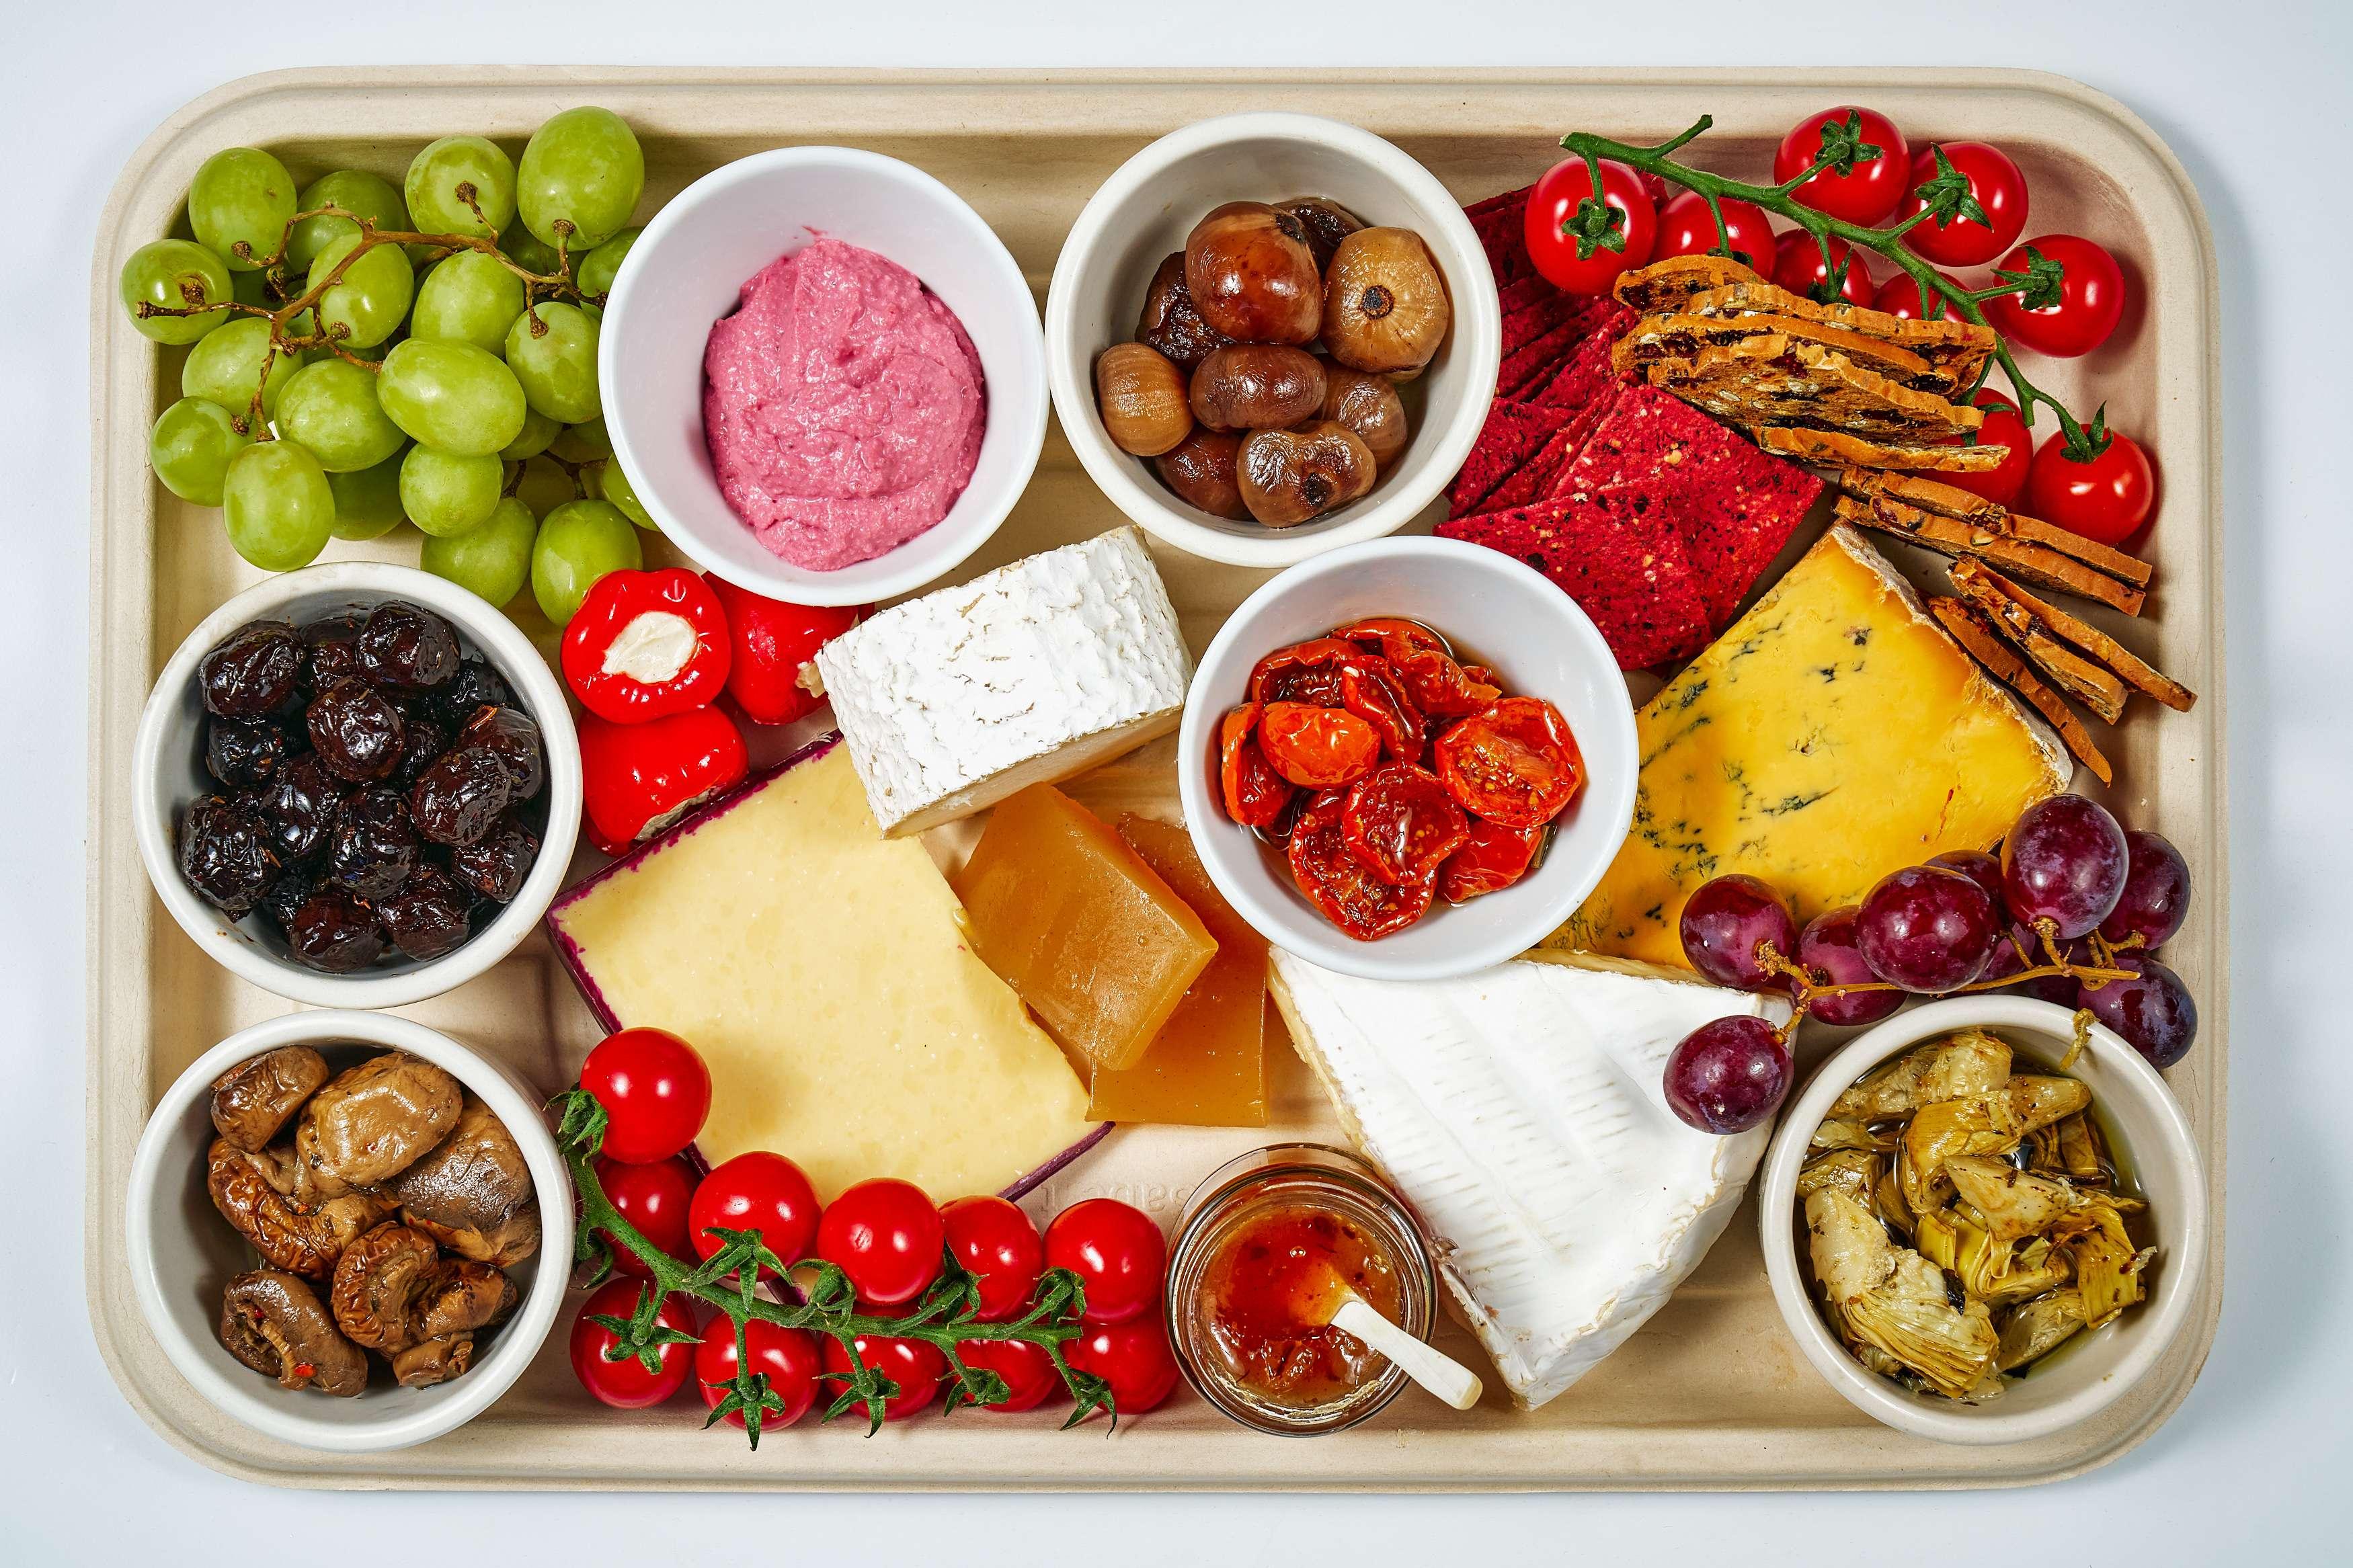 Vegetarian Cheese & Antipasti Platter